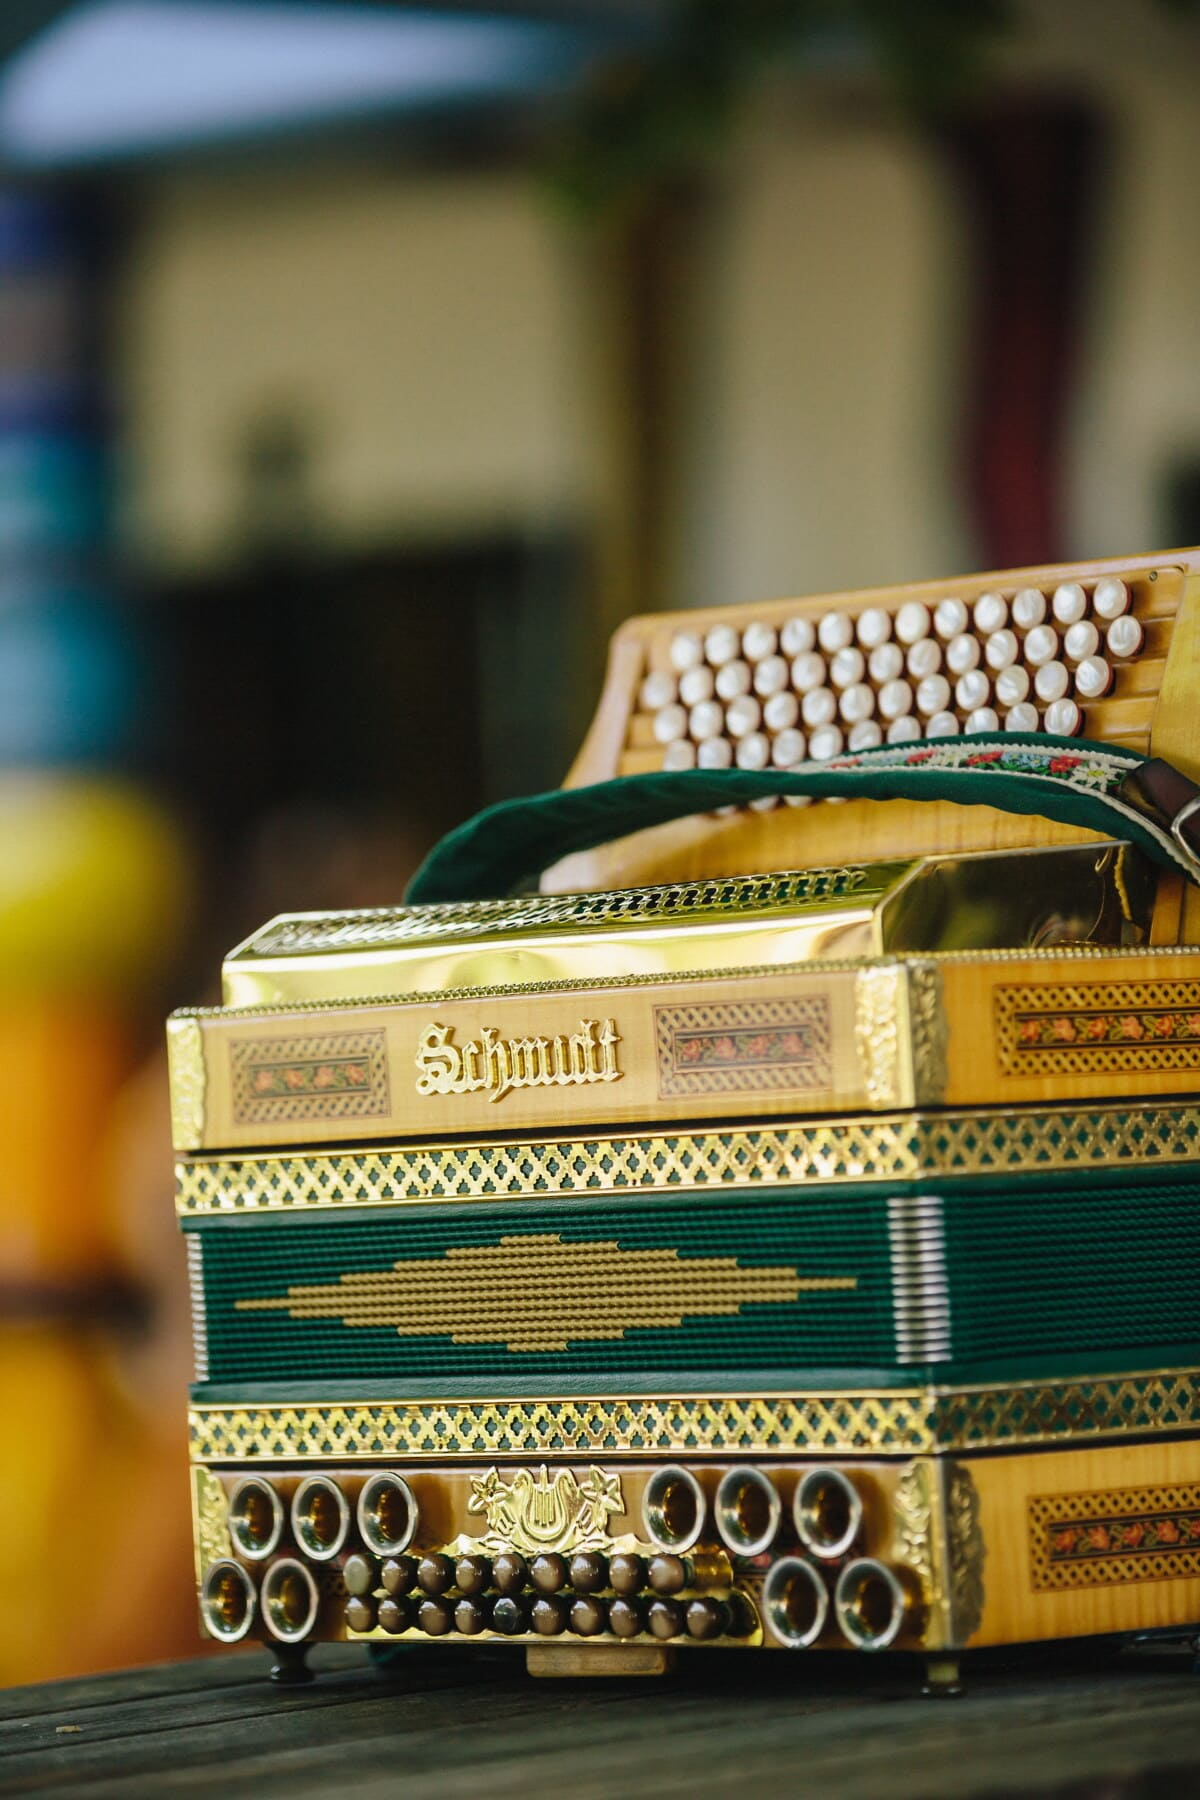 accordion, nostalgia, vintage, instrument, music, golden shine, shining, yellowish brown, indoors, retro